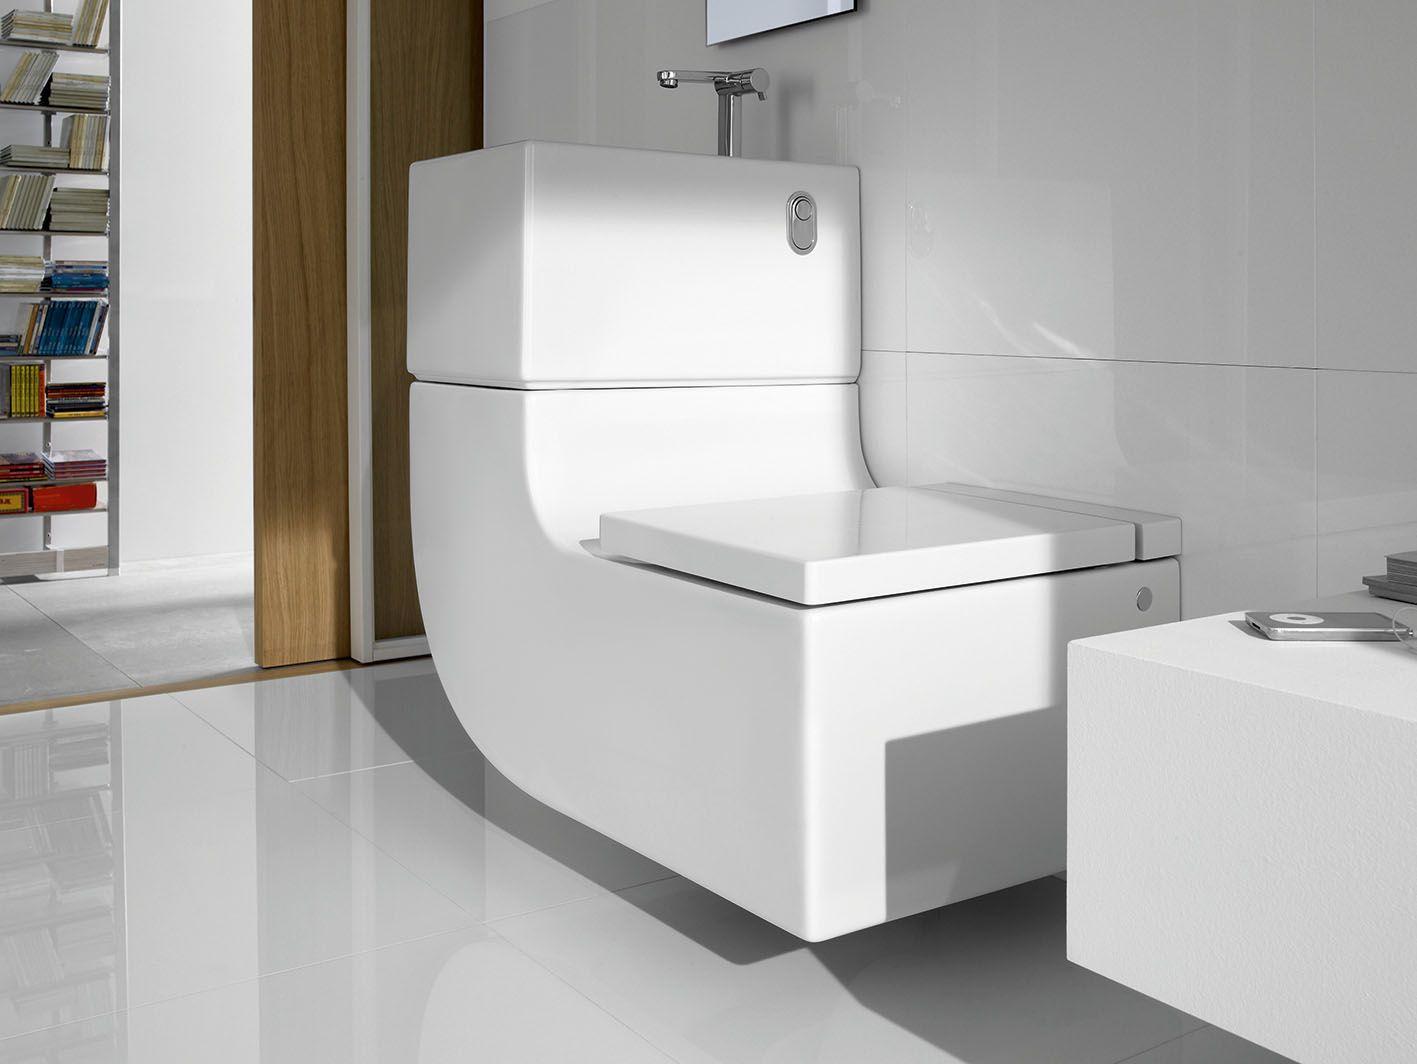 roca-bathroom-fittings-decor.jpg (1417×1064)   Bathrooms   Pinterest